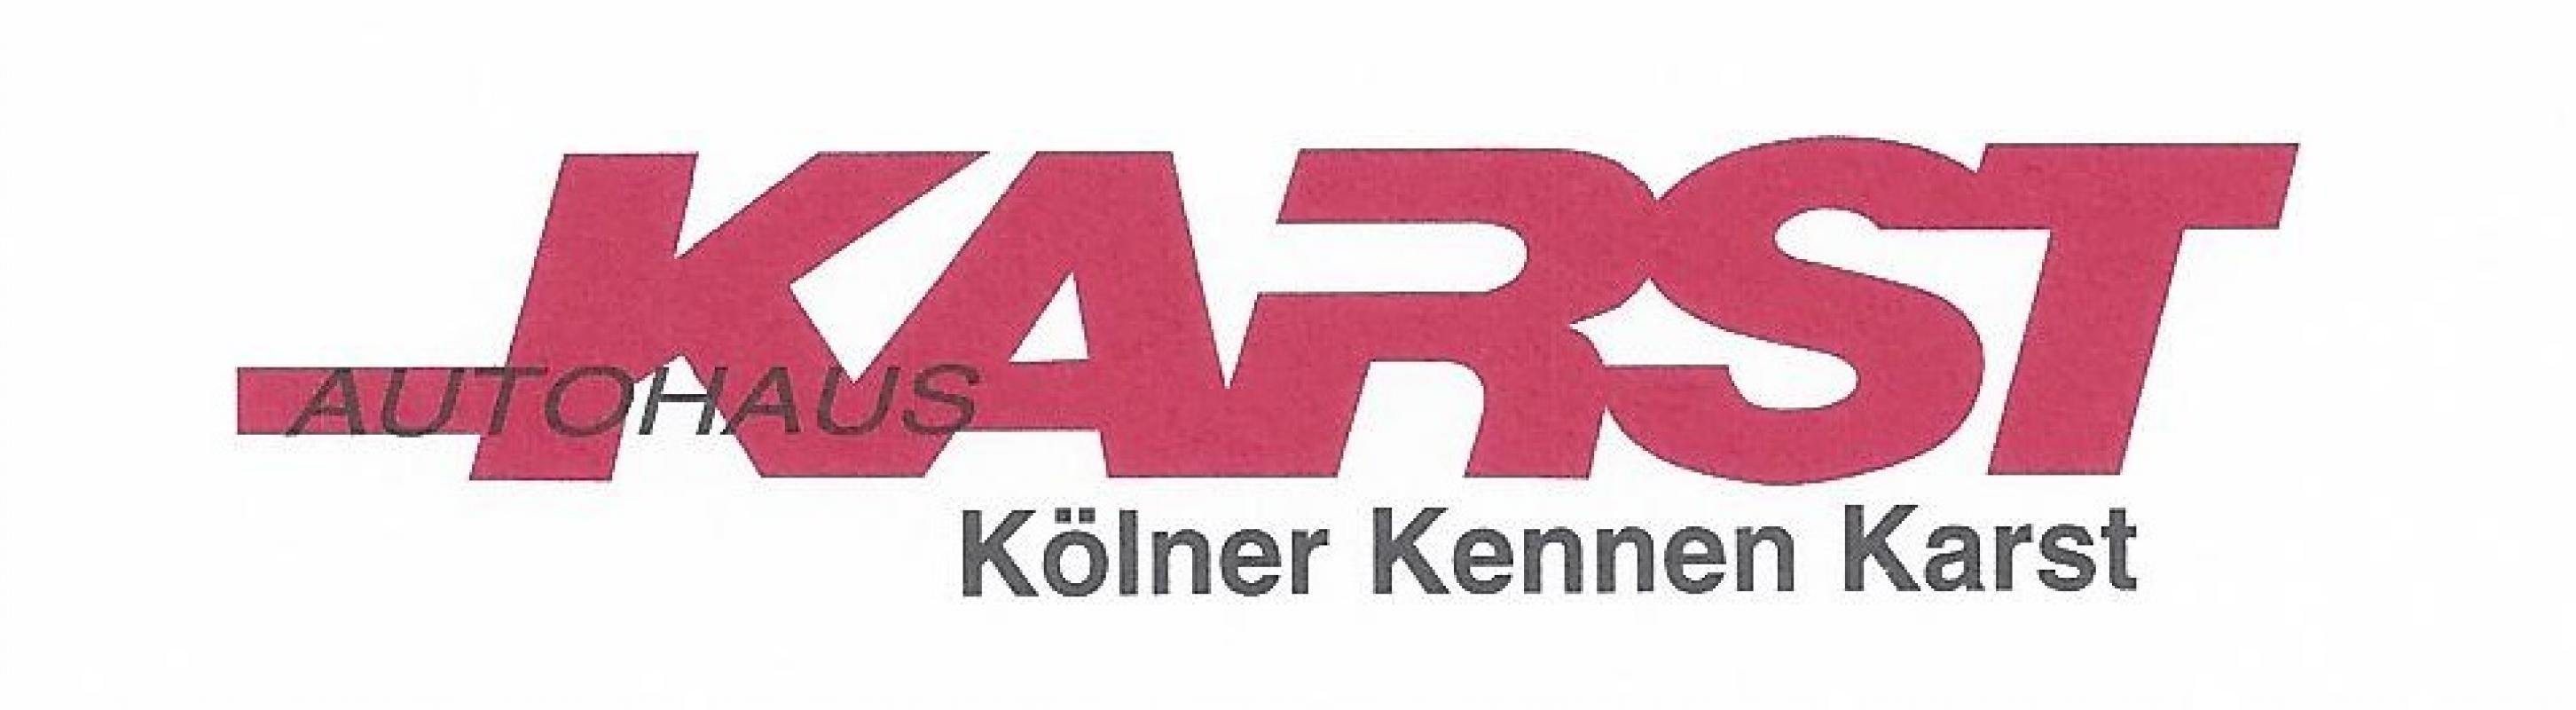 Autohaus Karst GmbH